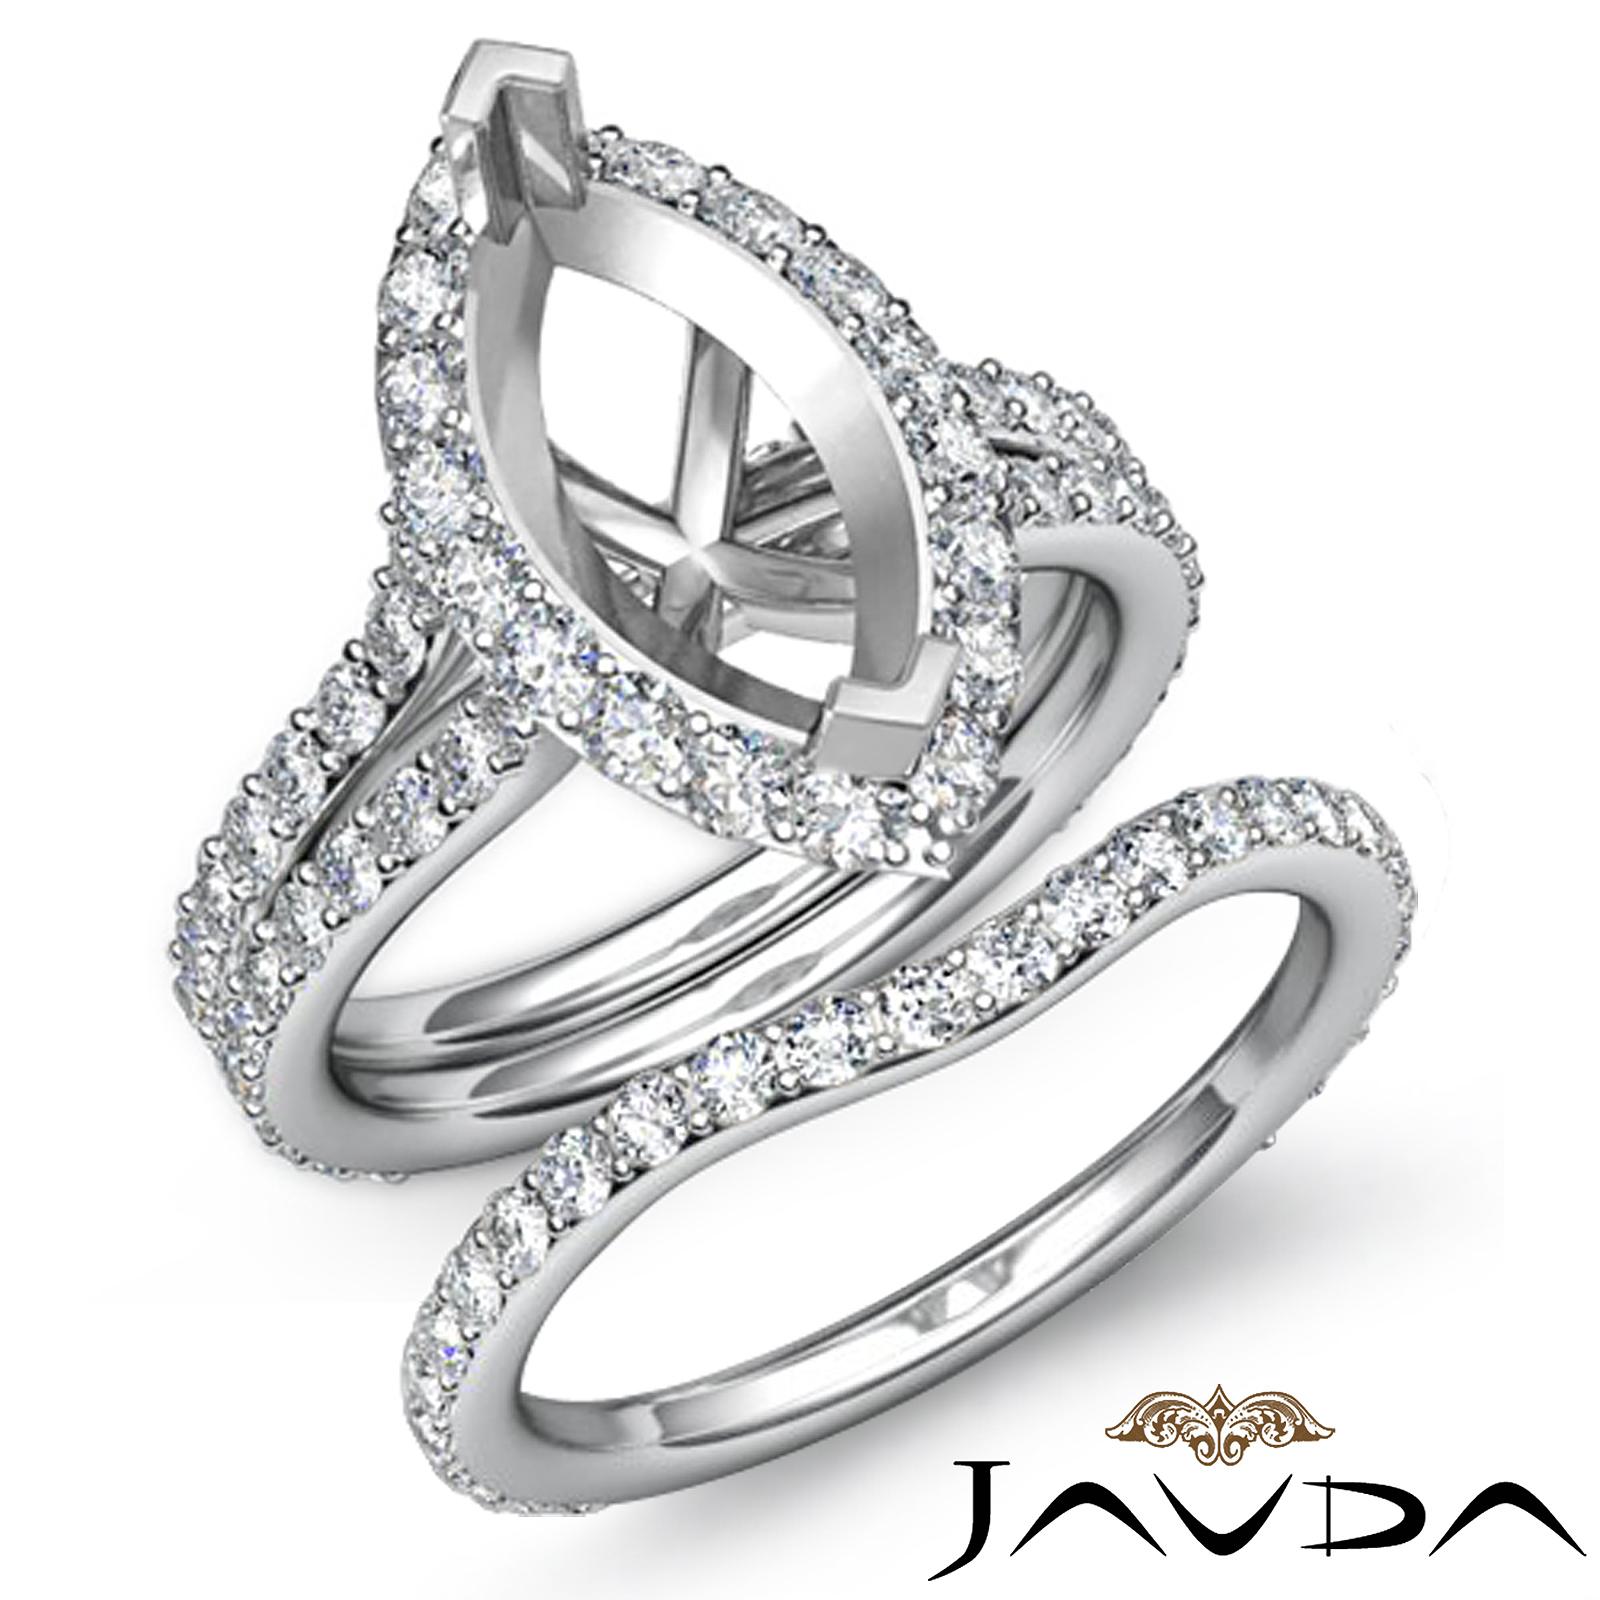 Marquise Diamond Semi Mount Engagement Wedding Ring Bridal Set Platinum 950 1